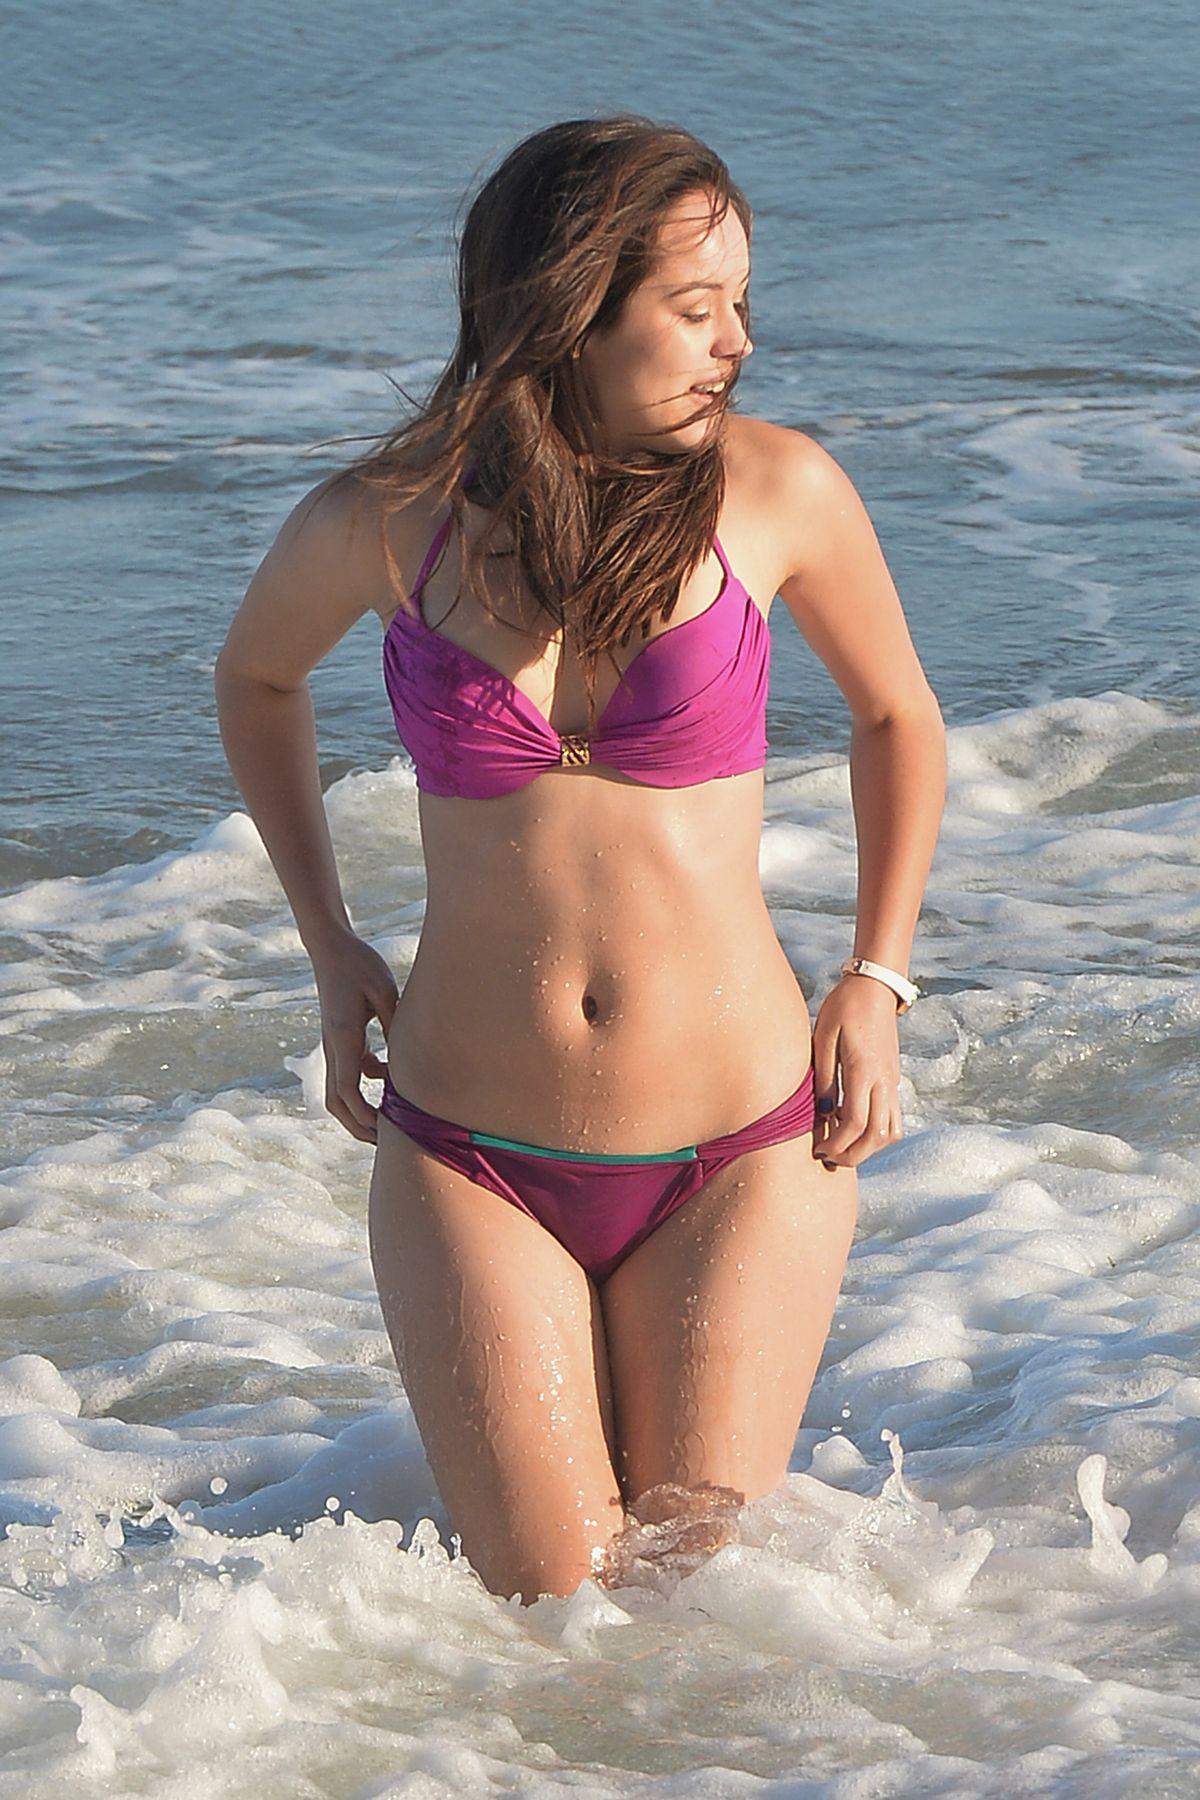 Boobs Bikini Grace Hayle  nudes (55 fotos), YouTube, bra